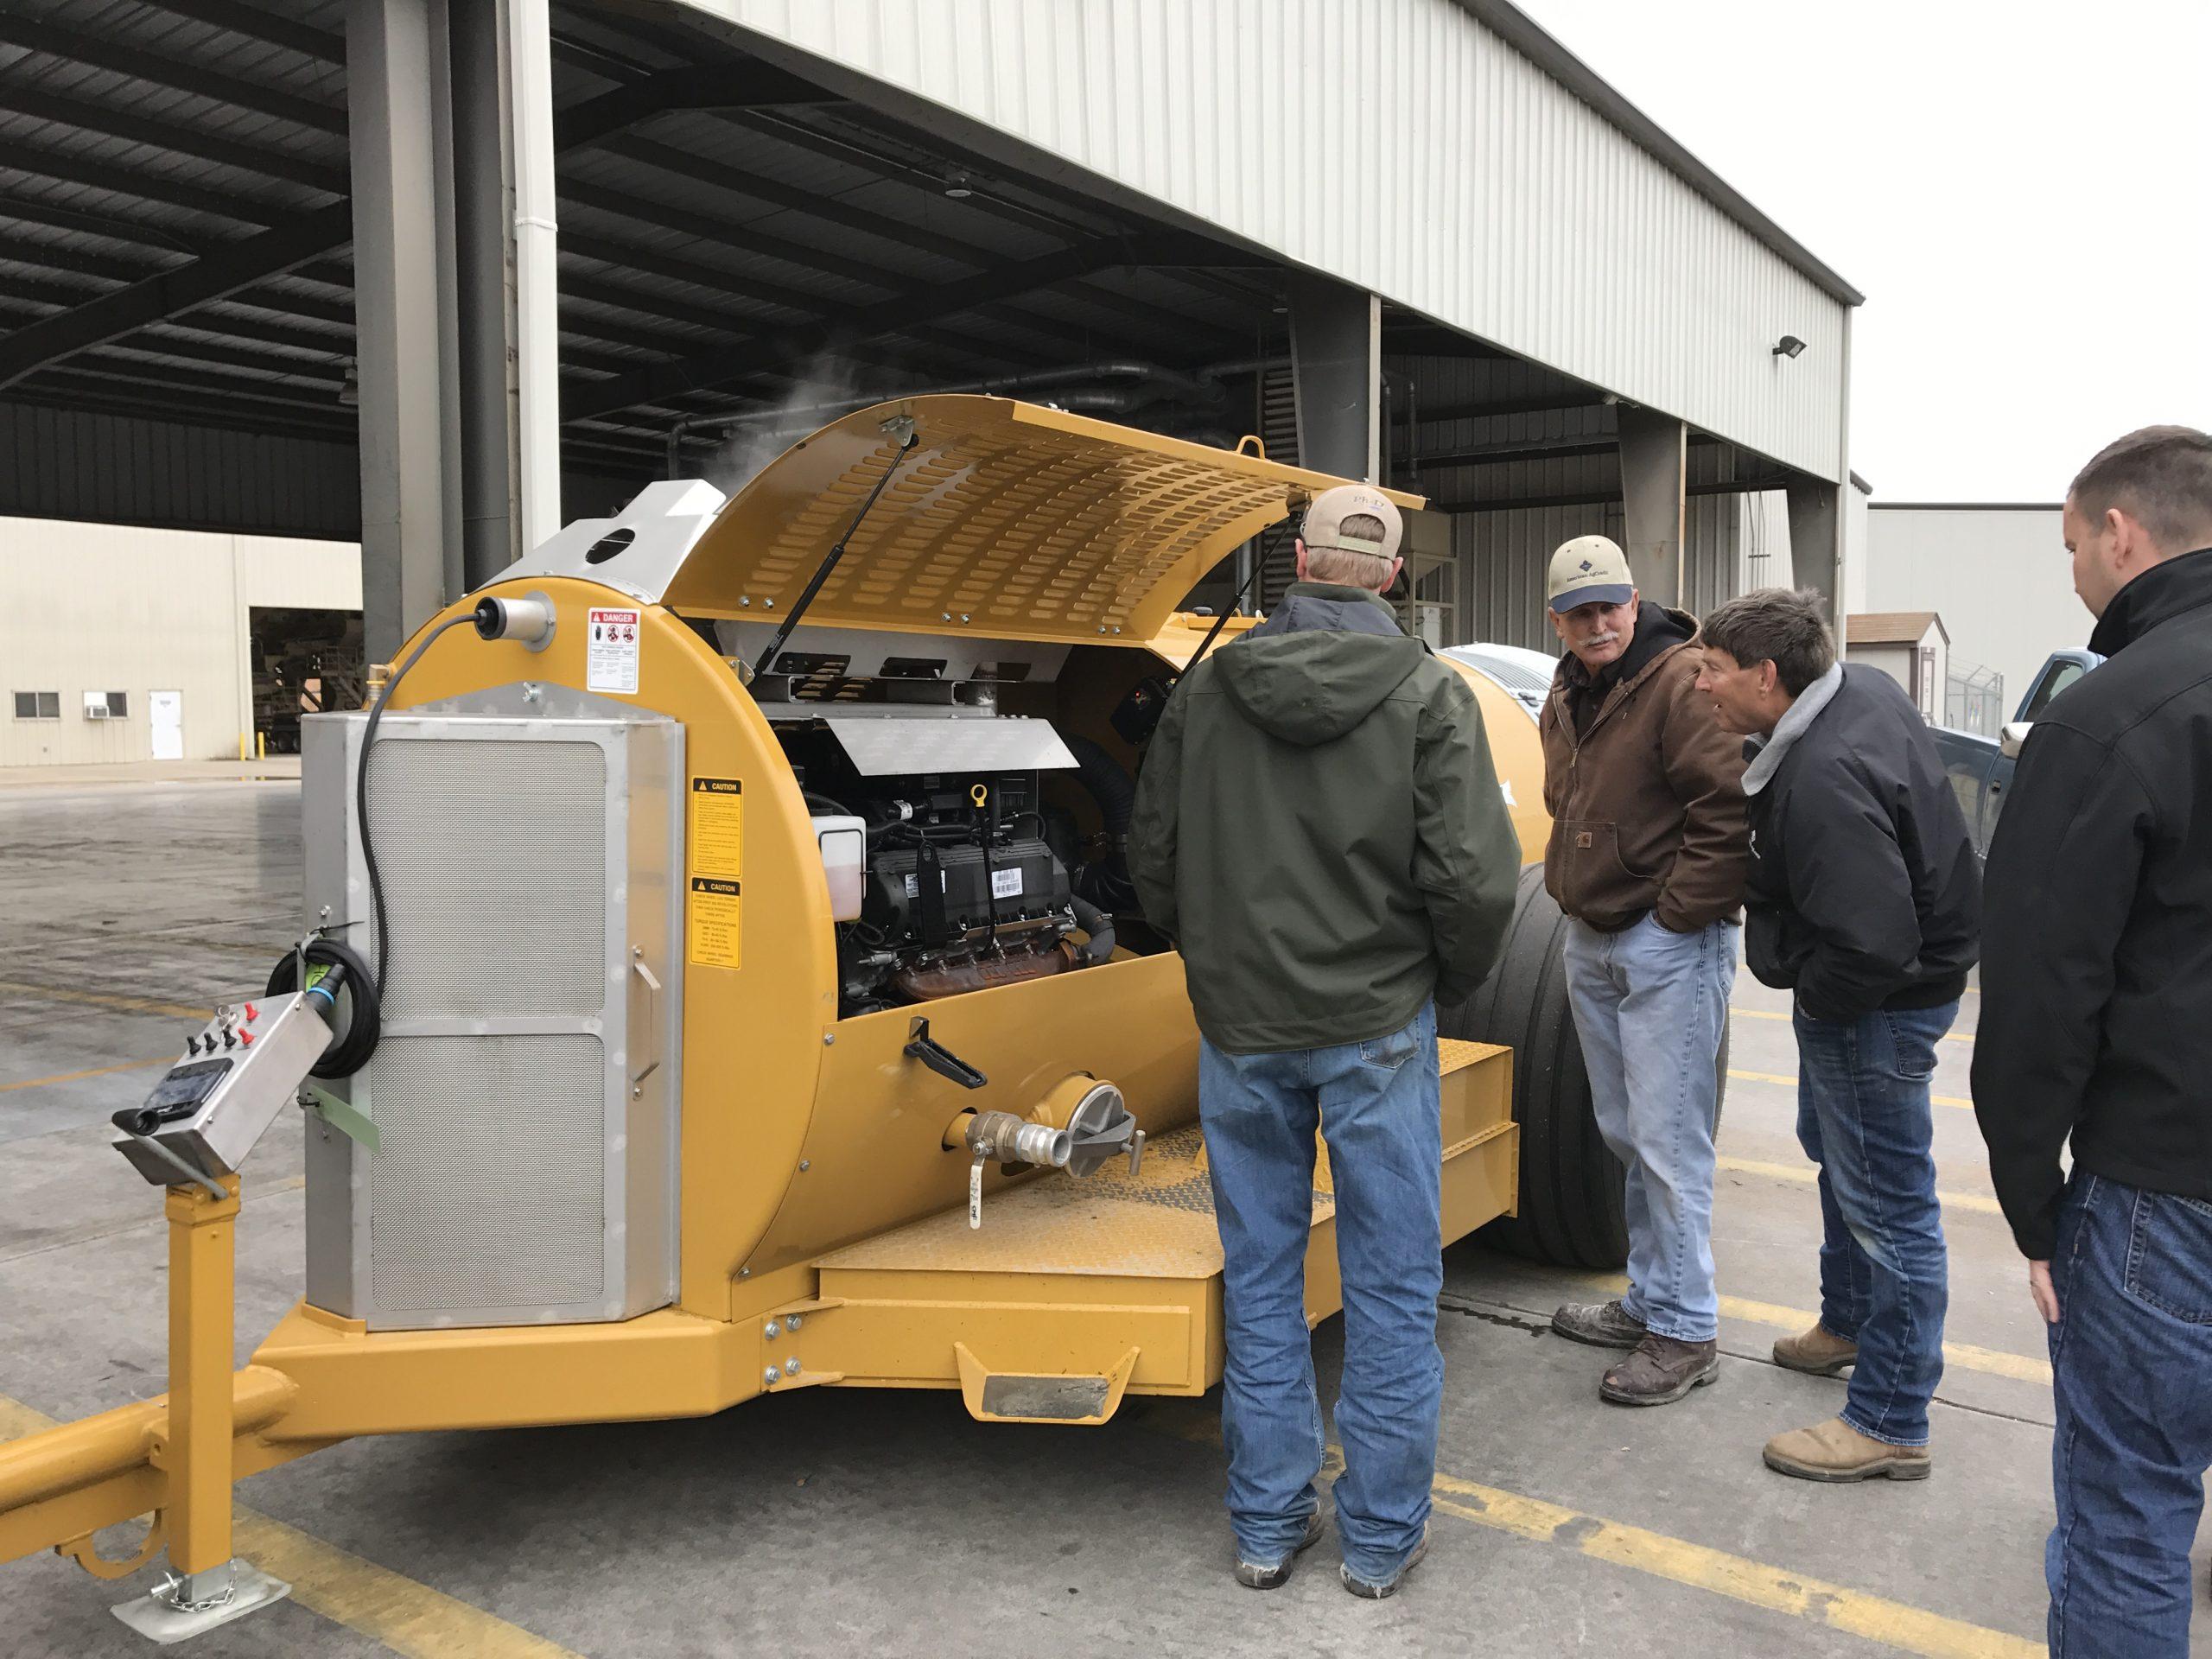 Partners Examining Equipment